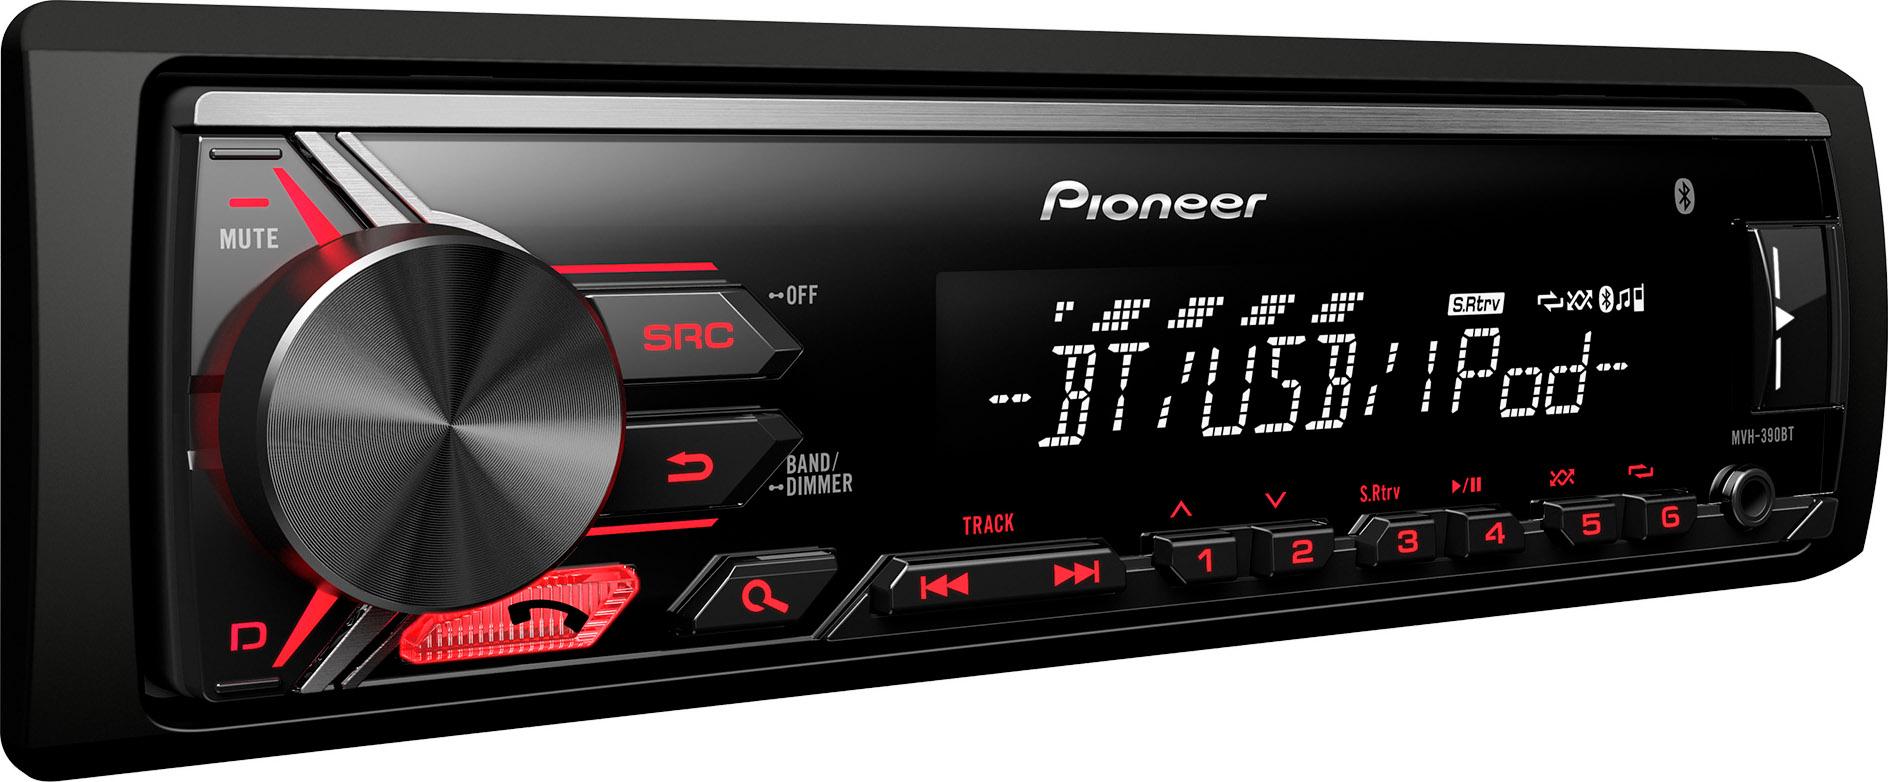 autoradio bluetooth pioneer stereo auto mvh 390bt. Black Bedroom Furniture Sets. Home Design Ideas